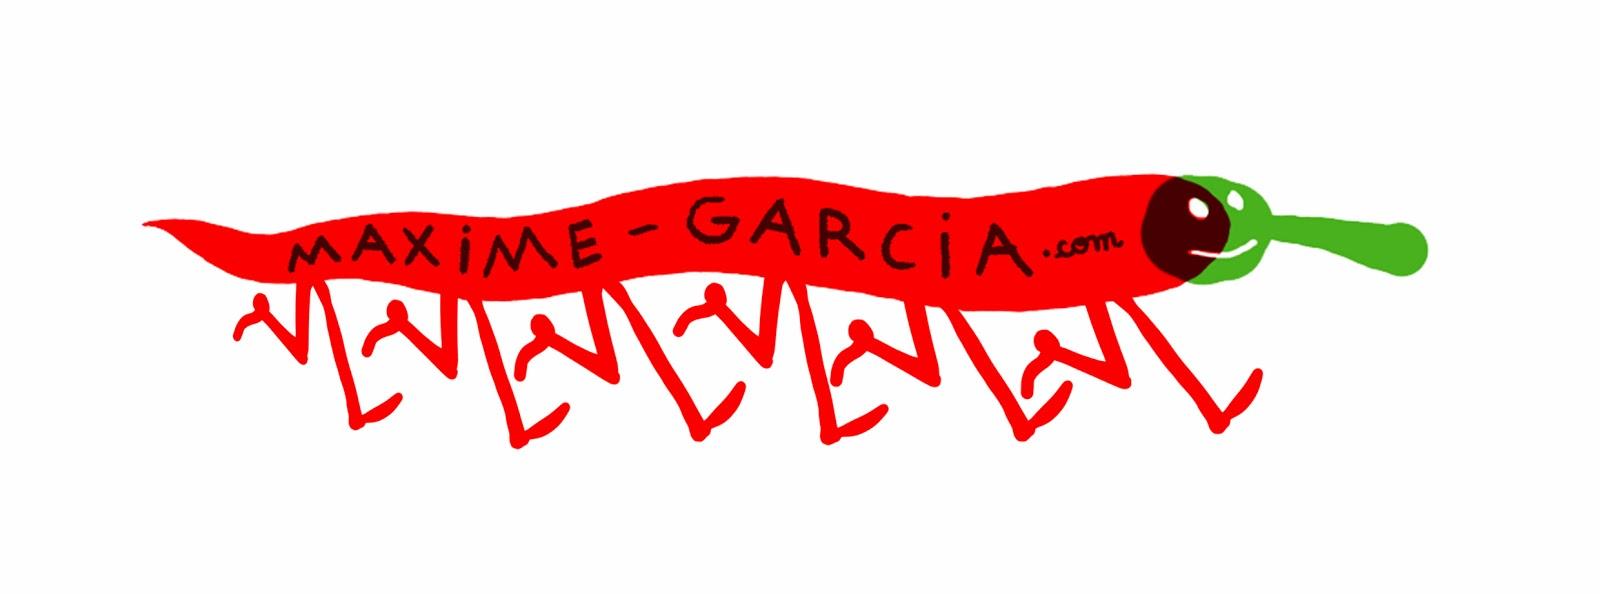 http://www.maxime-garcia.com/bande-dessinees/extraits-de-livres/sublime-minable-new